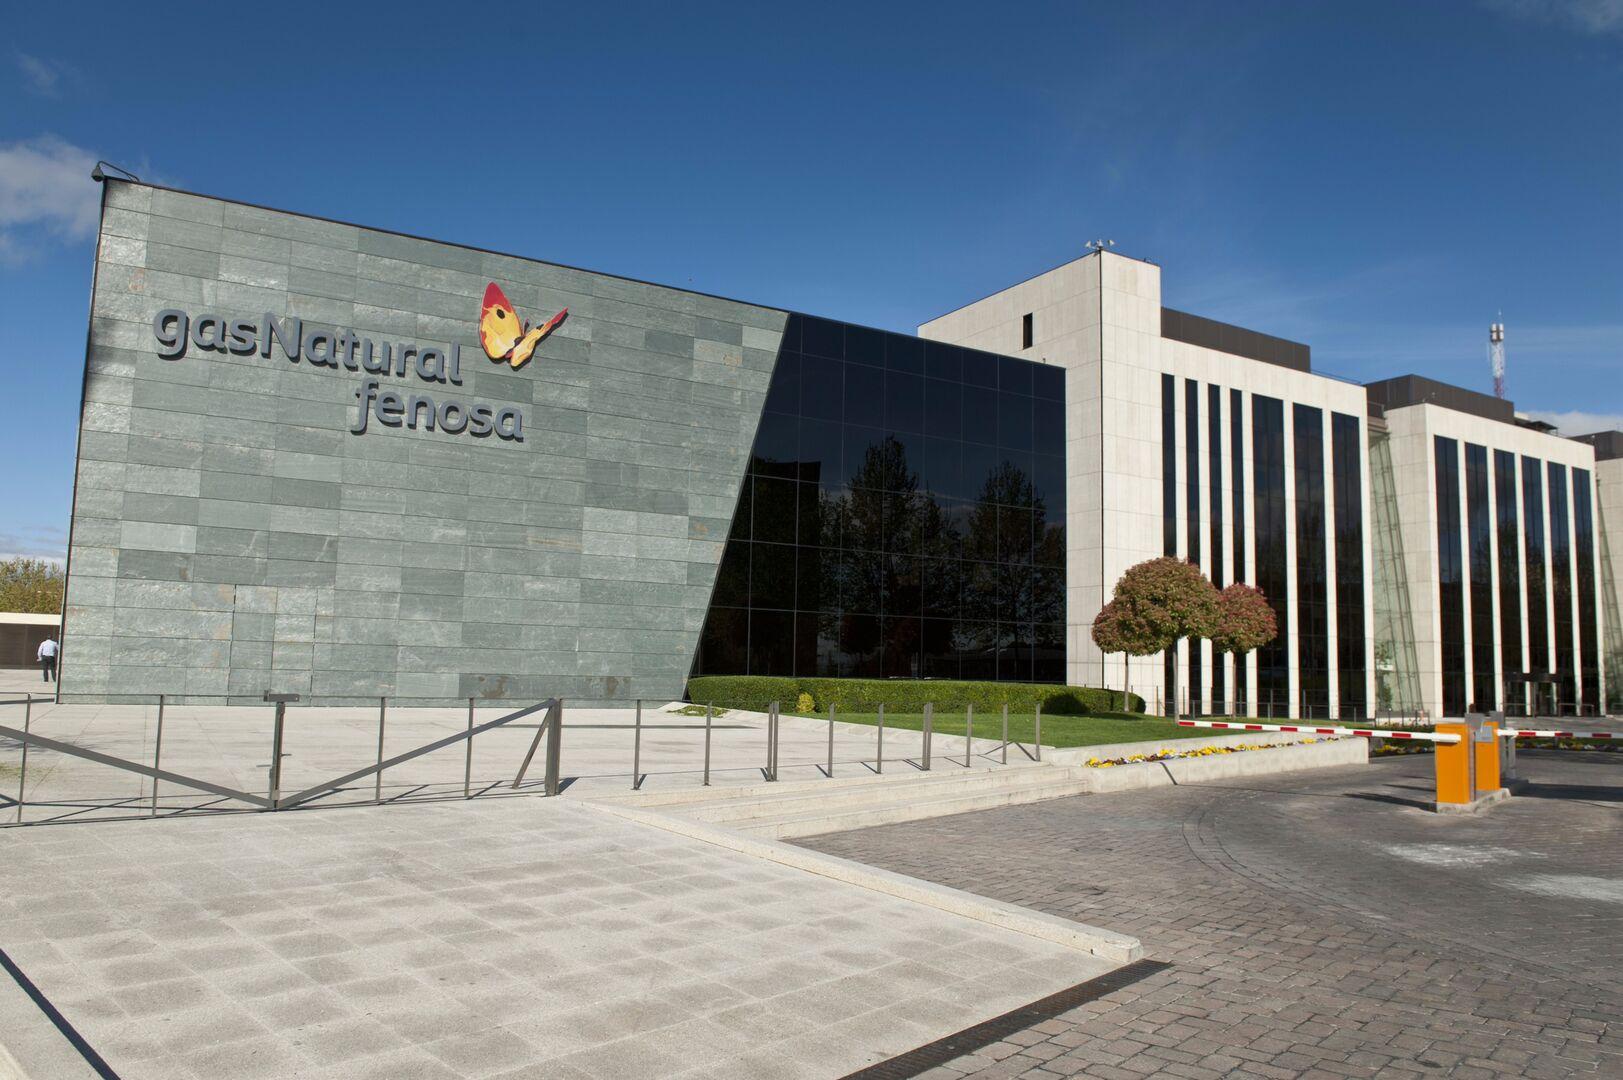 Gas natural cambia su sede de barcelona a madrid libre for Oficinas gas natural